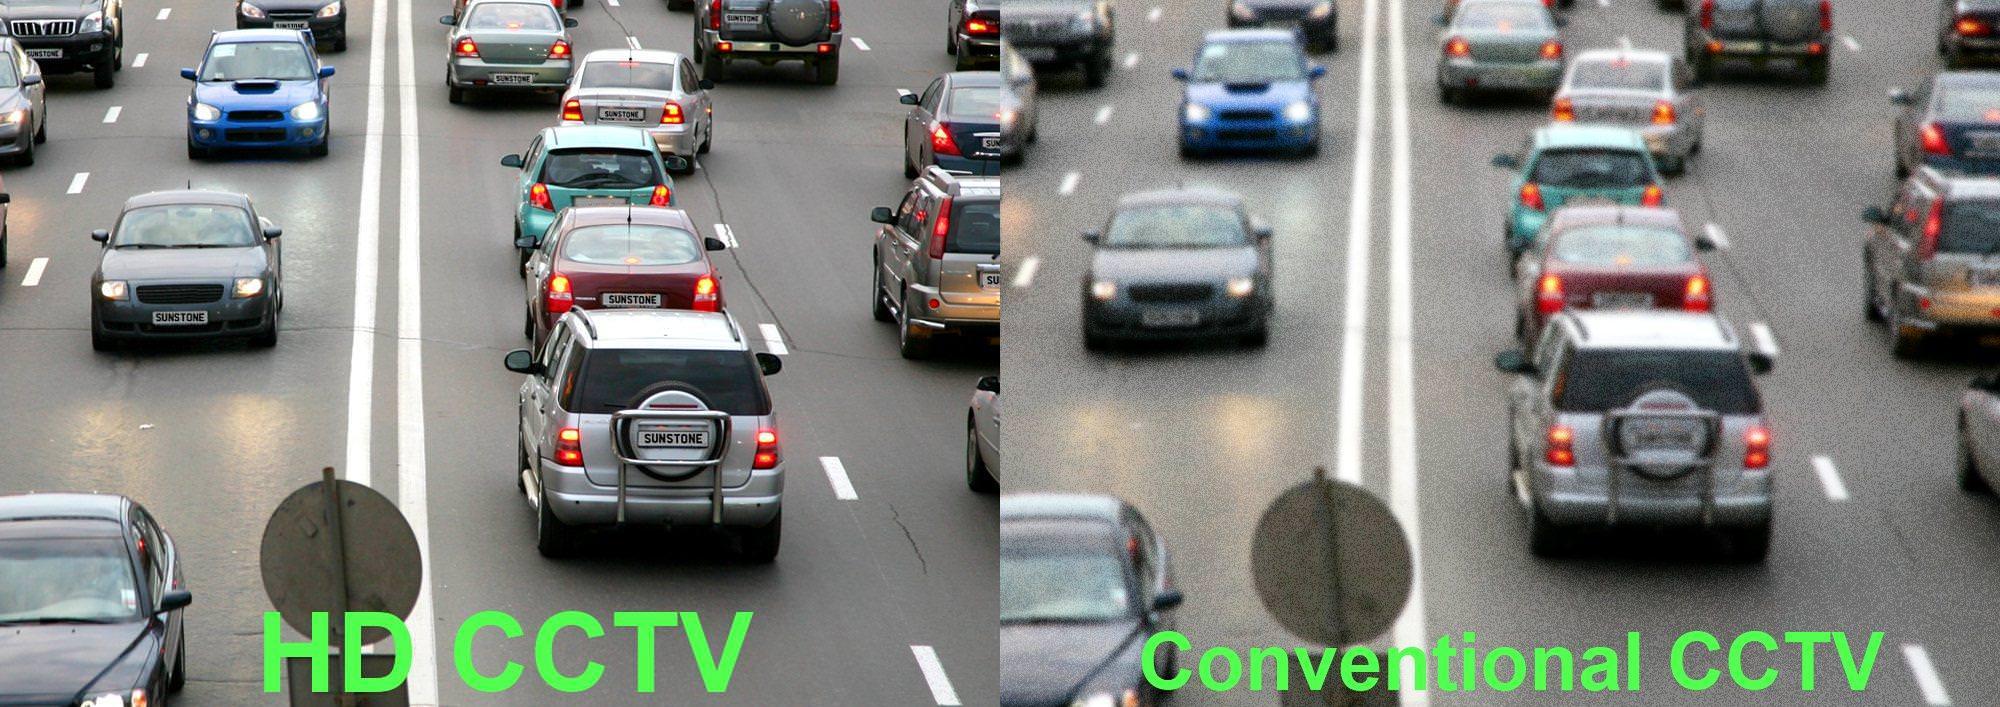 مقایسه دوربین مداربسته آنالوگ و دوربین مداربسته اچ دی